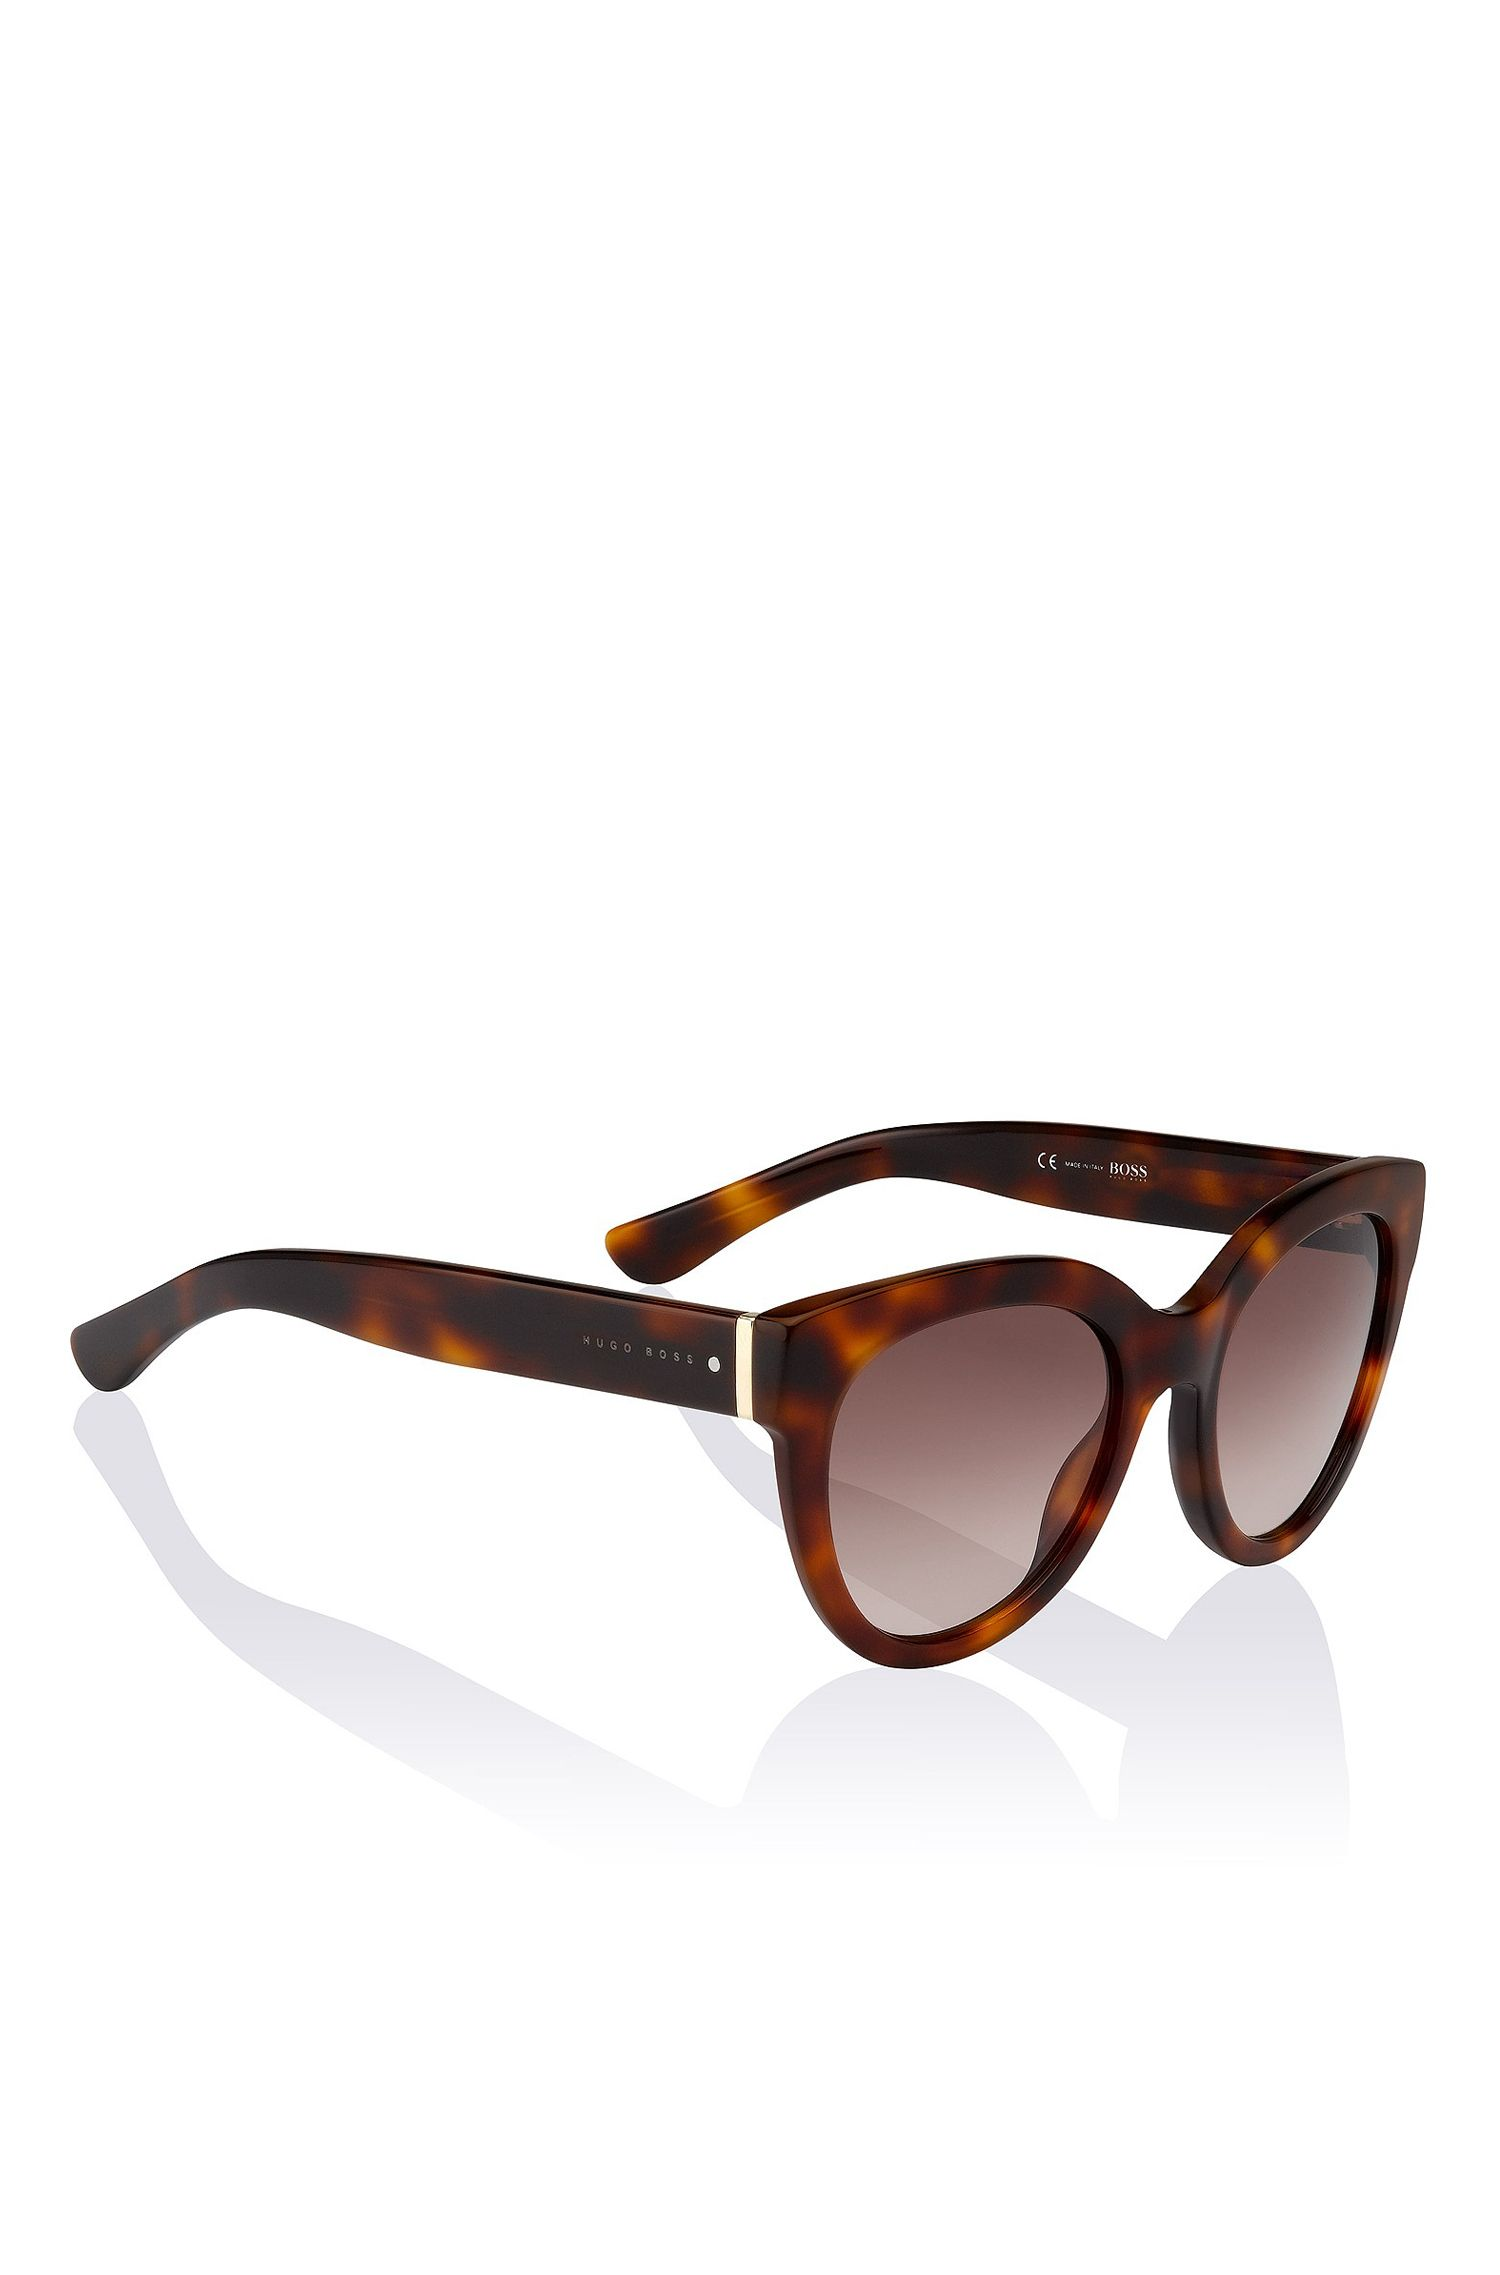 'BOSS 0675S' | Gradient Lens Cateye Sunglasses